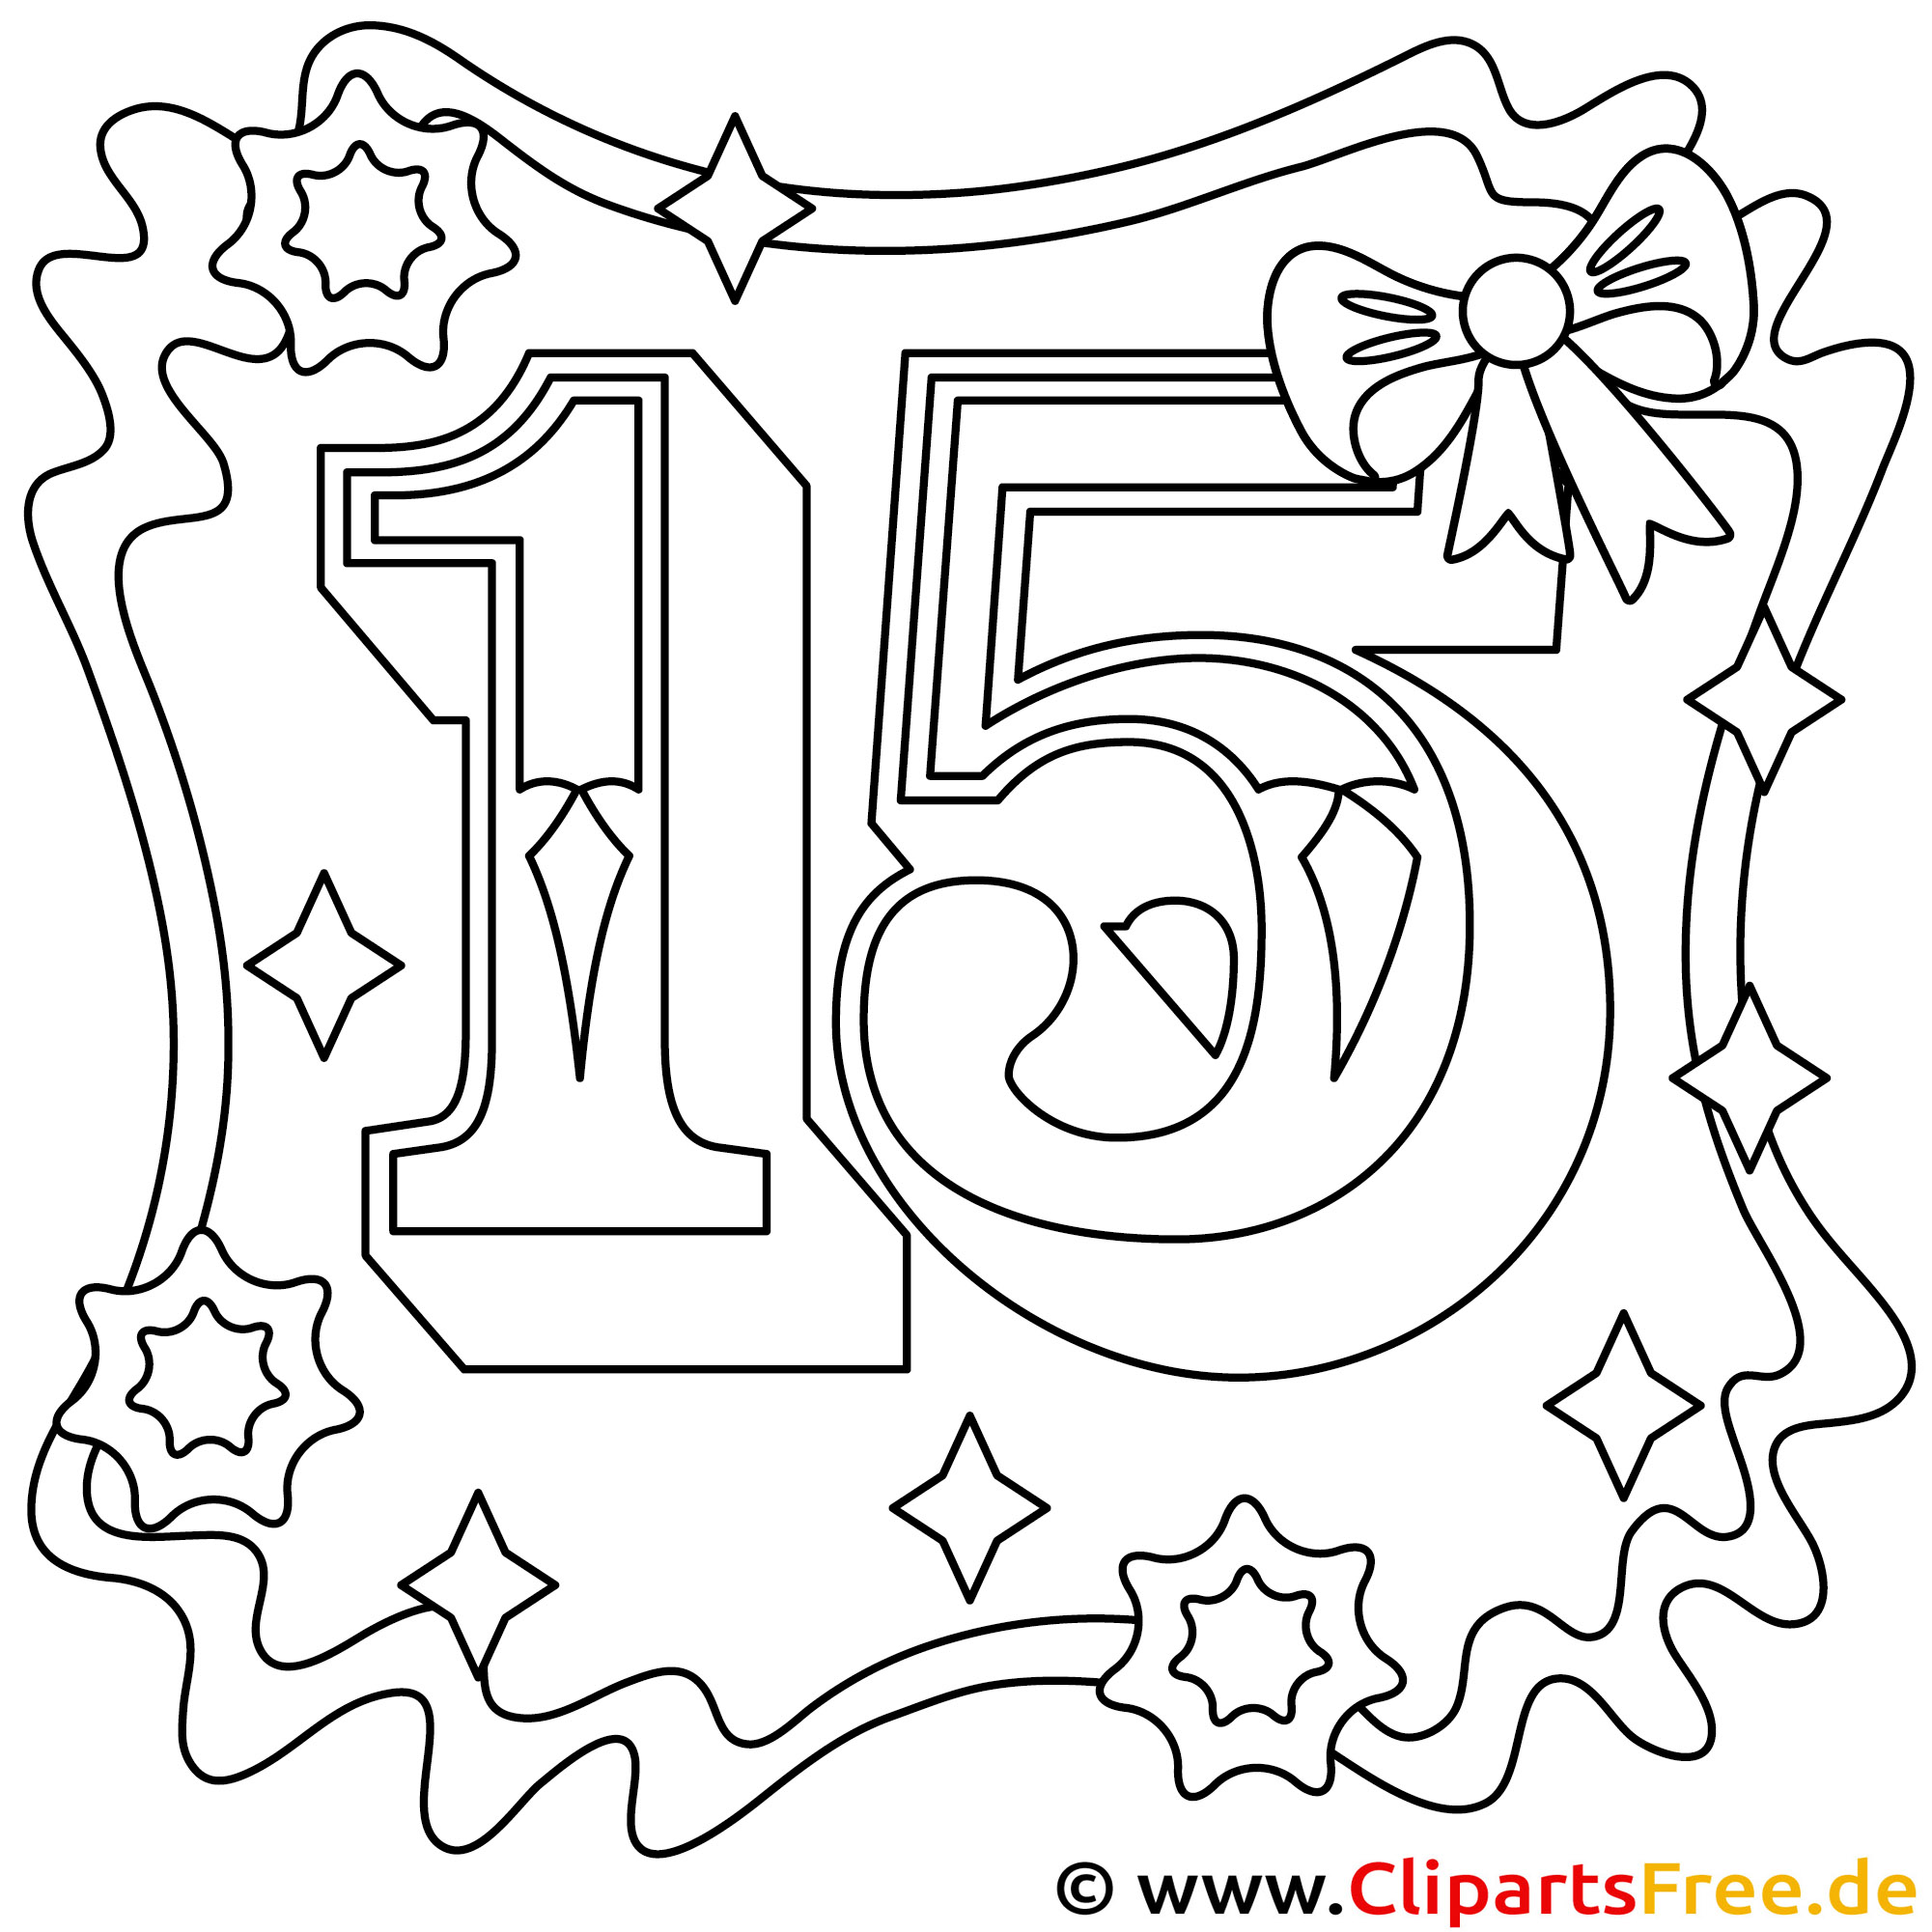 Ausmalbild zum 15 Geburtstag